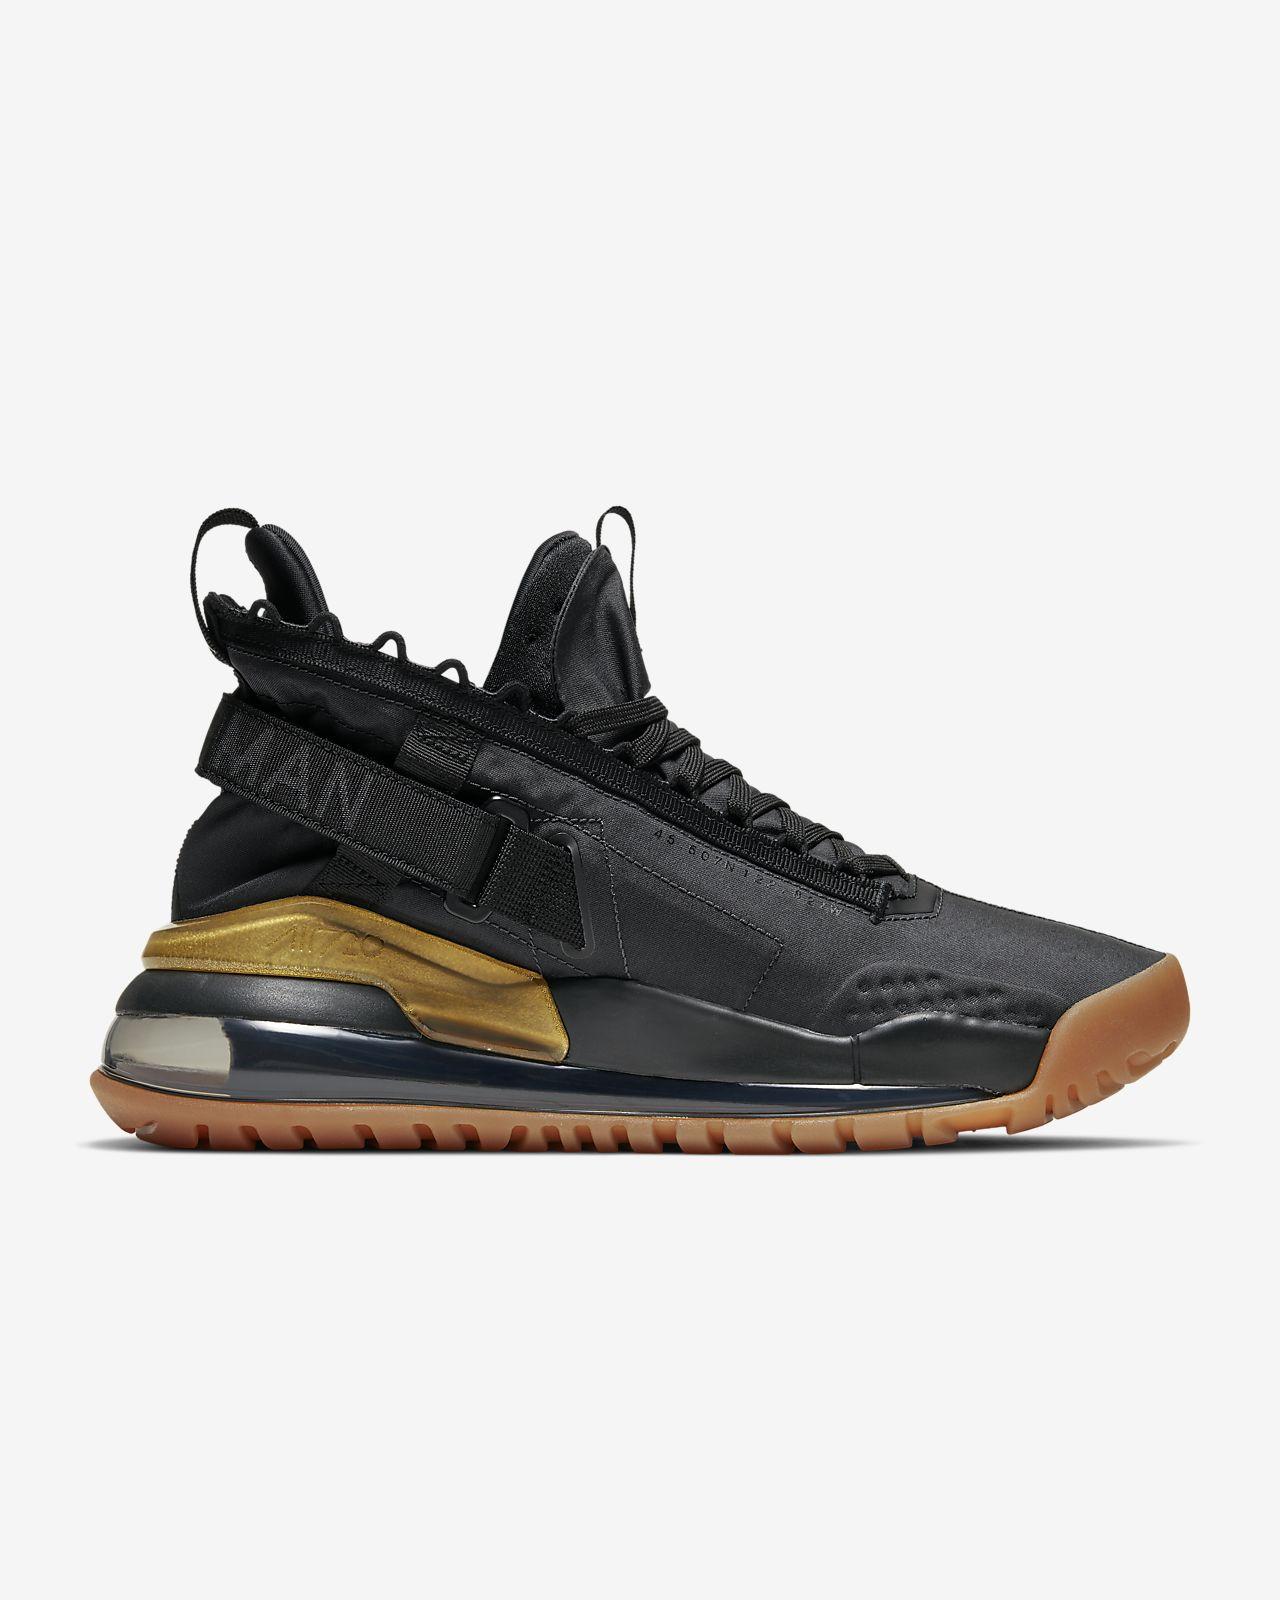 Jordan Proto Max 720 Club Gold